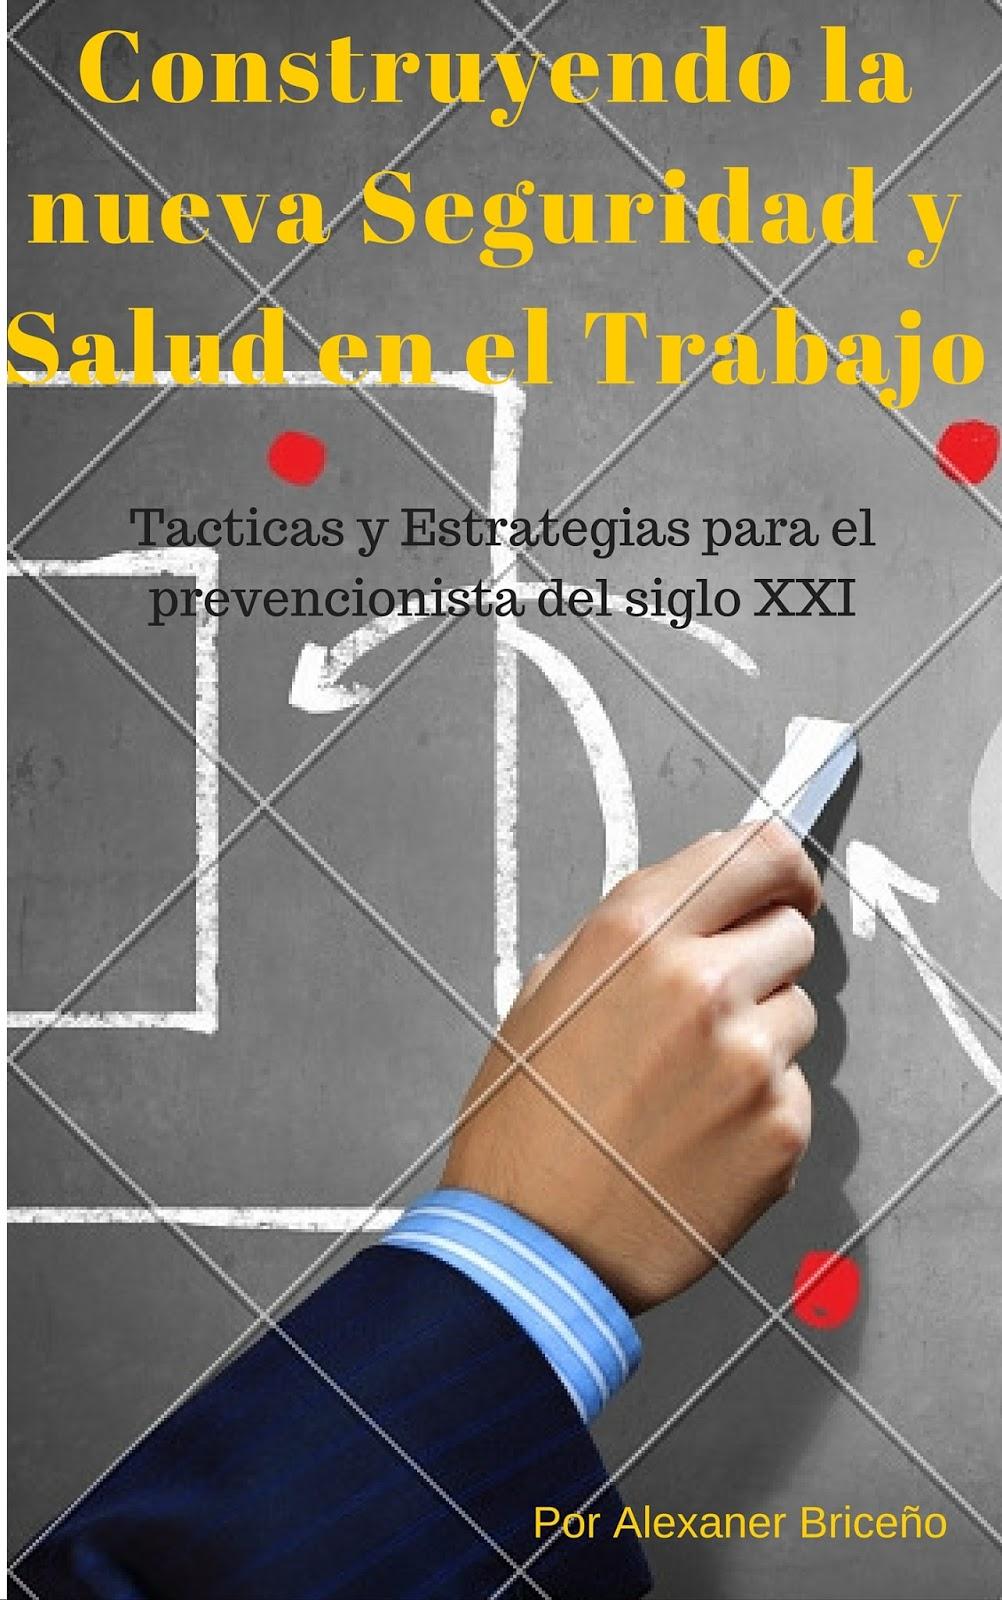 http://www.amazon.com/Construyendo-Seguridad-T%C3%A1cticas-Estrategias-Prevencionista-ebook/dp/B00N22ADUU/ref=sr_1_cc_1?s=aps&ie=UTF8&qid=1427592900&sr=1-1-catcorr&keywords=alexander+brice%C3%B1o